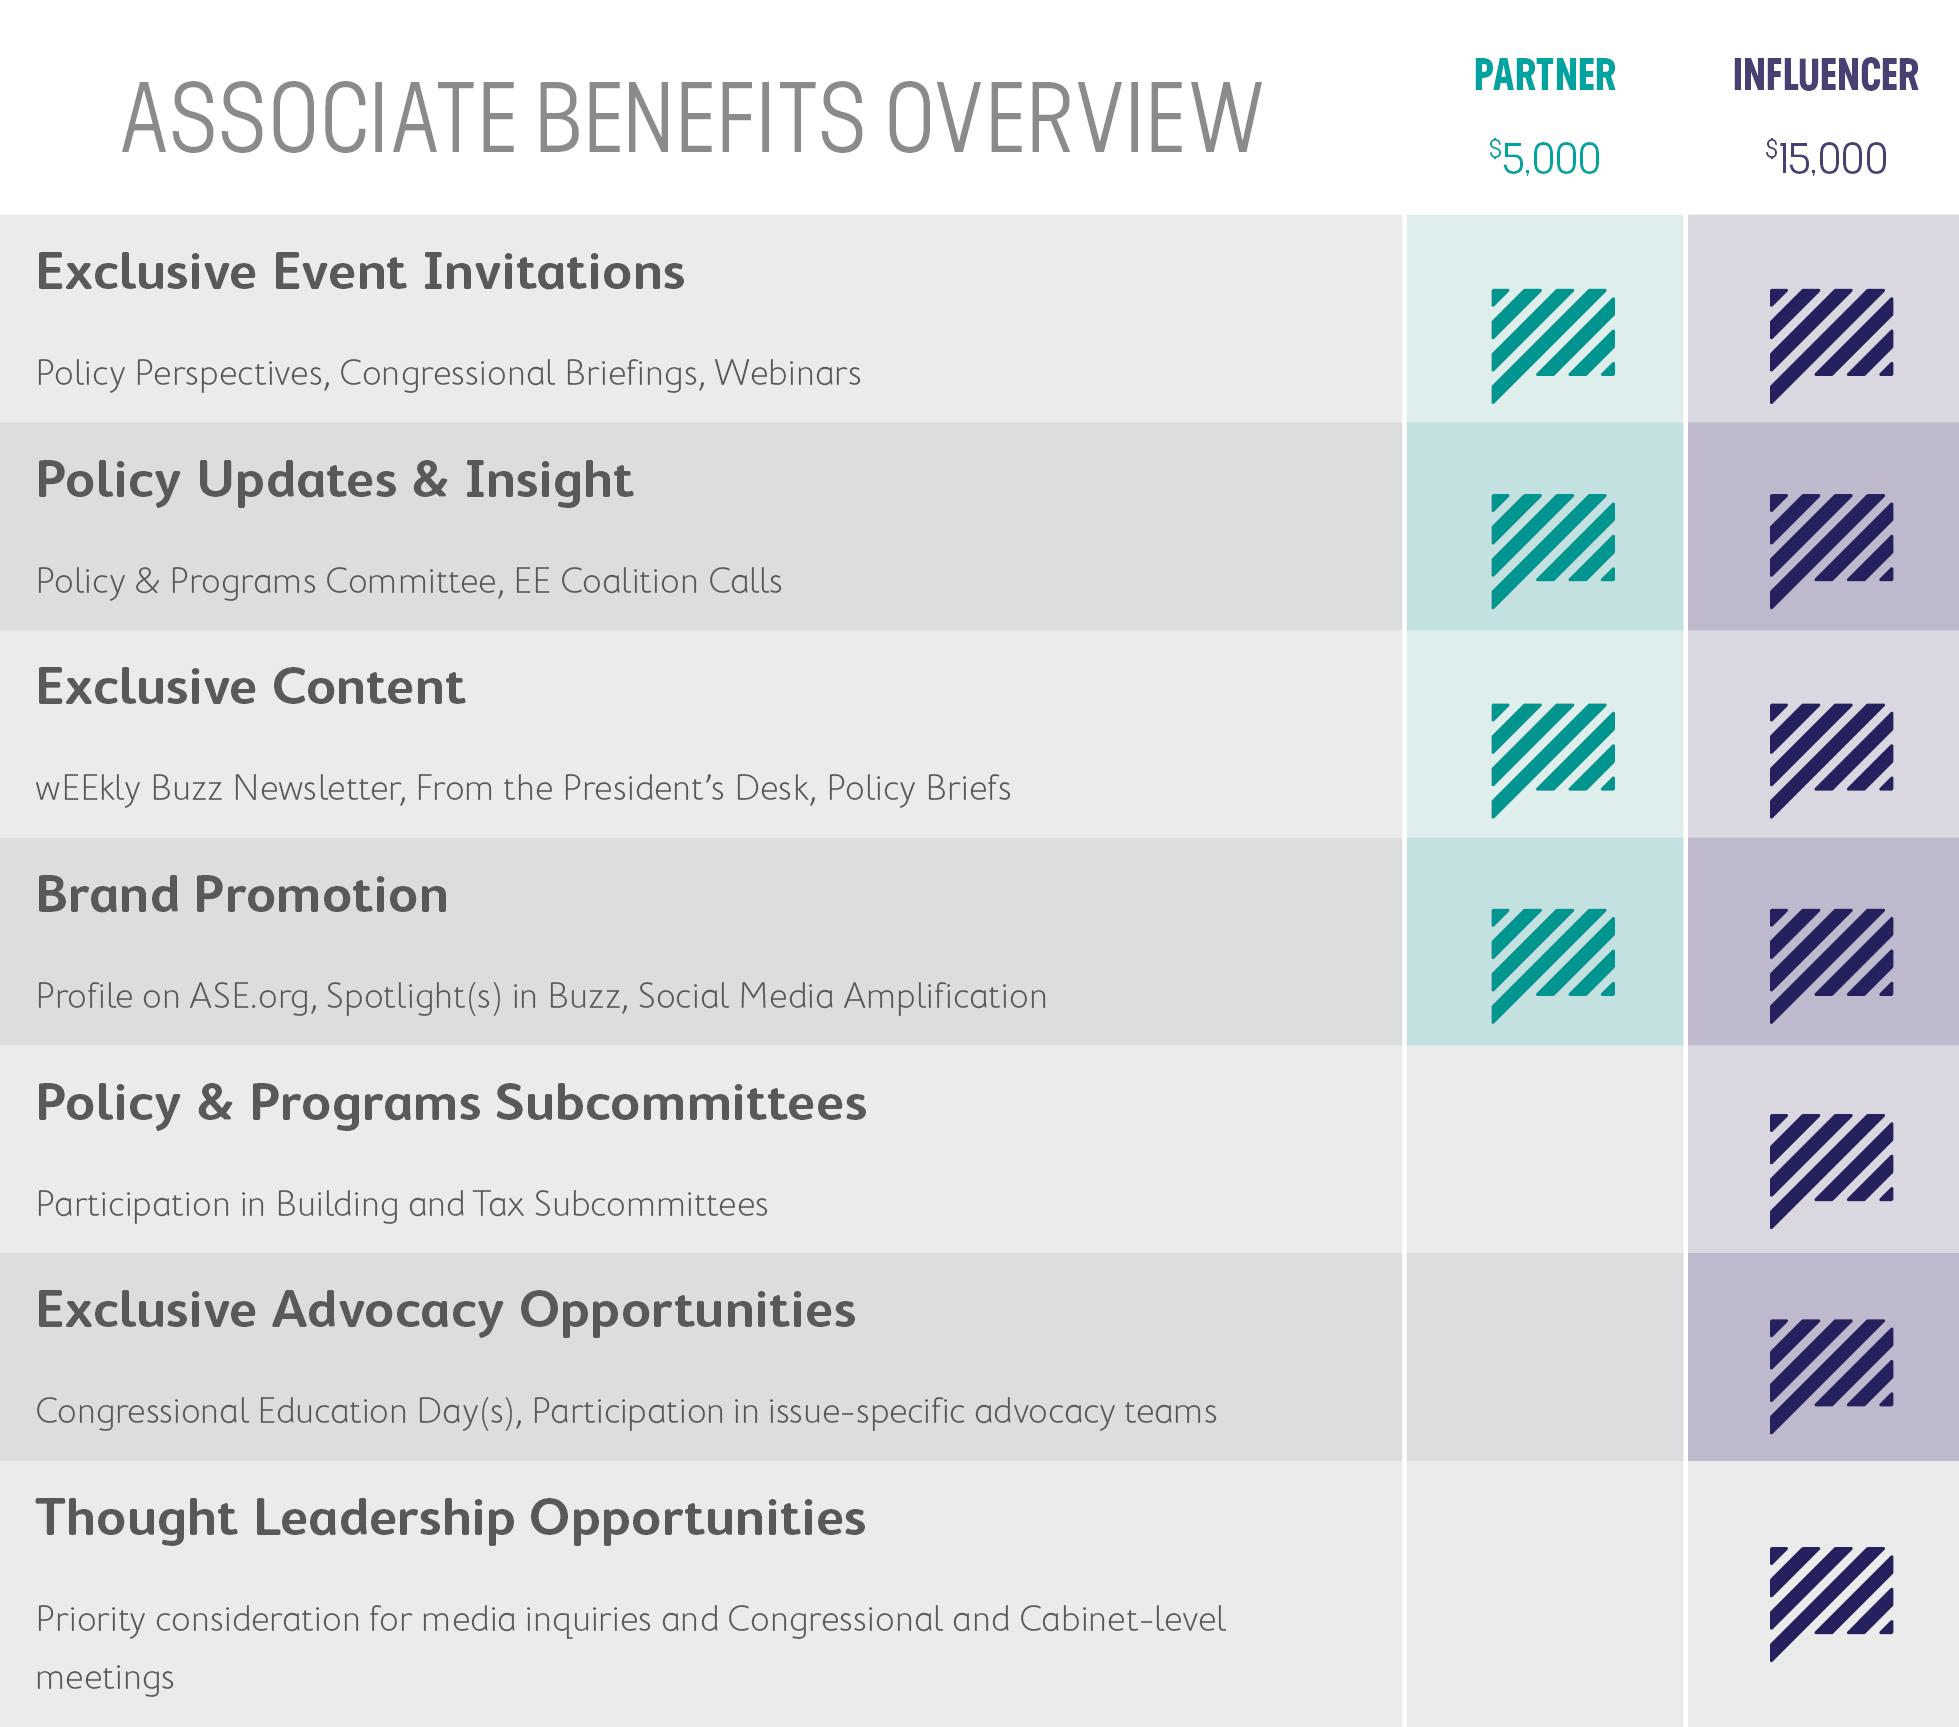 Associates Benefits